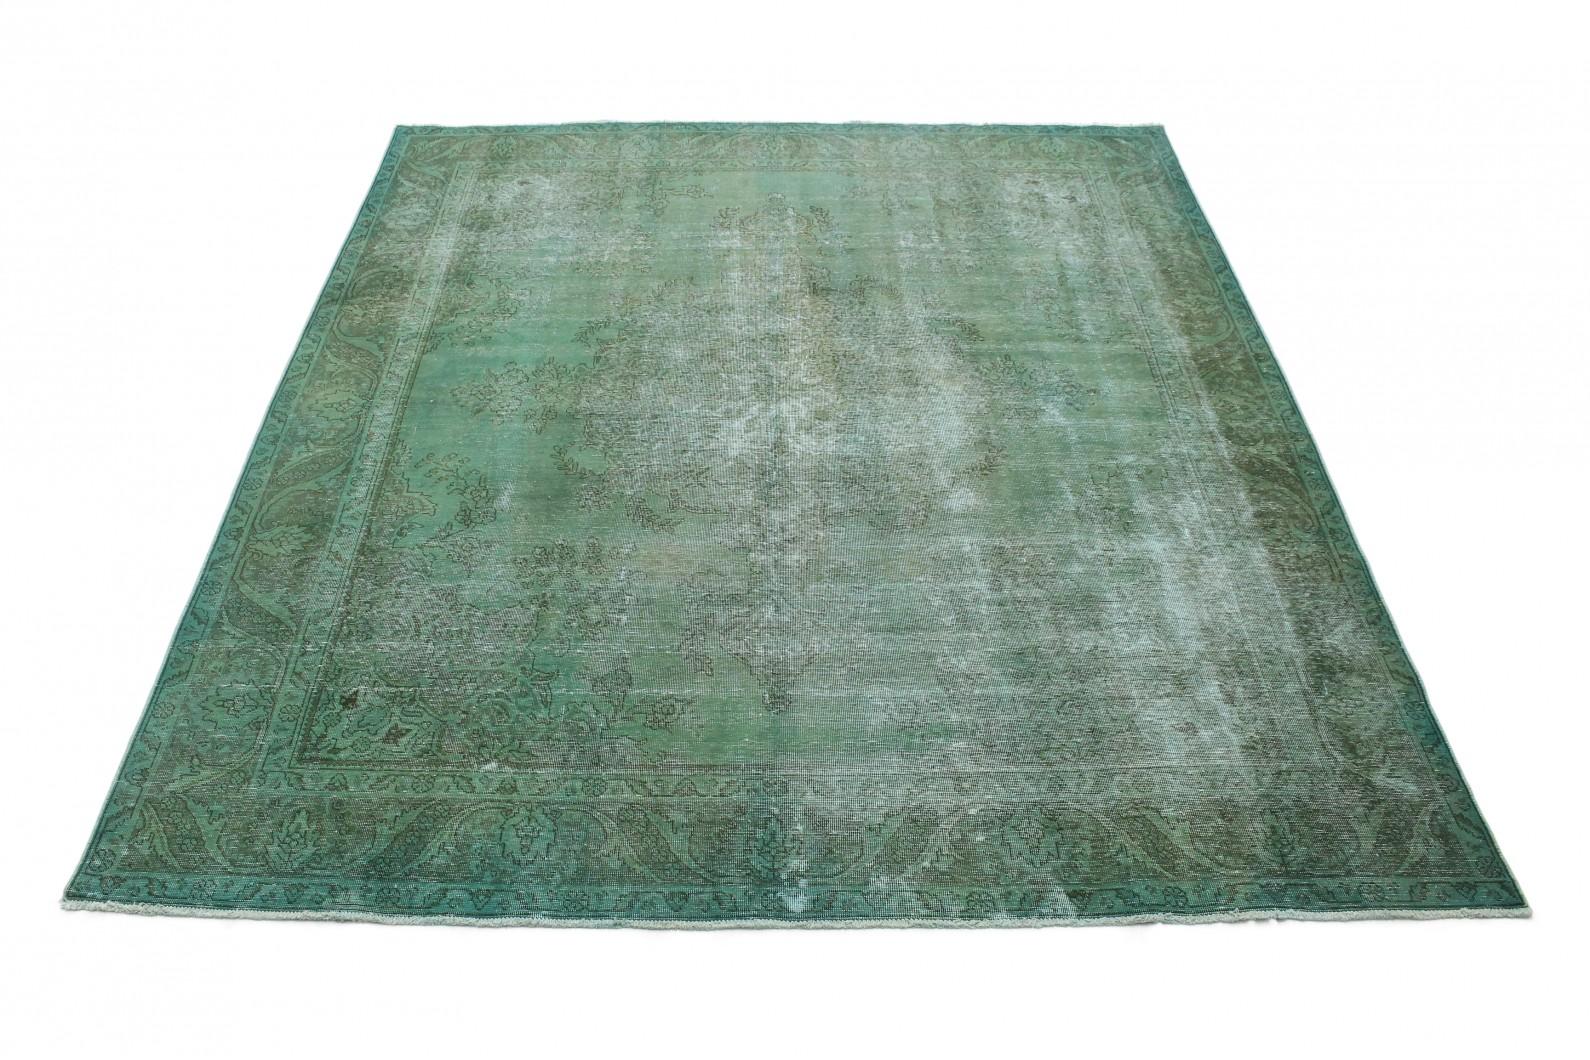 Vintage Teppich Grün Grau in 350x290 (1 / 5)